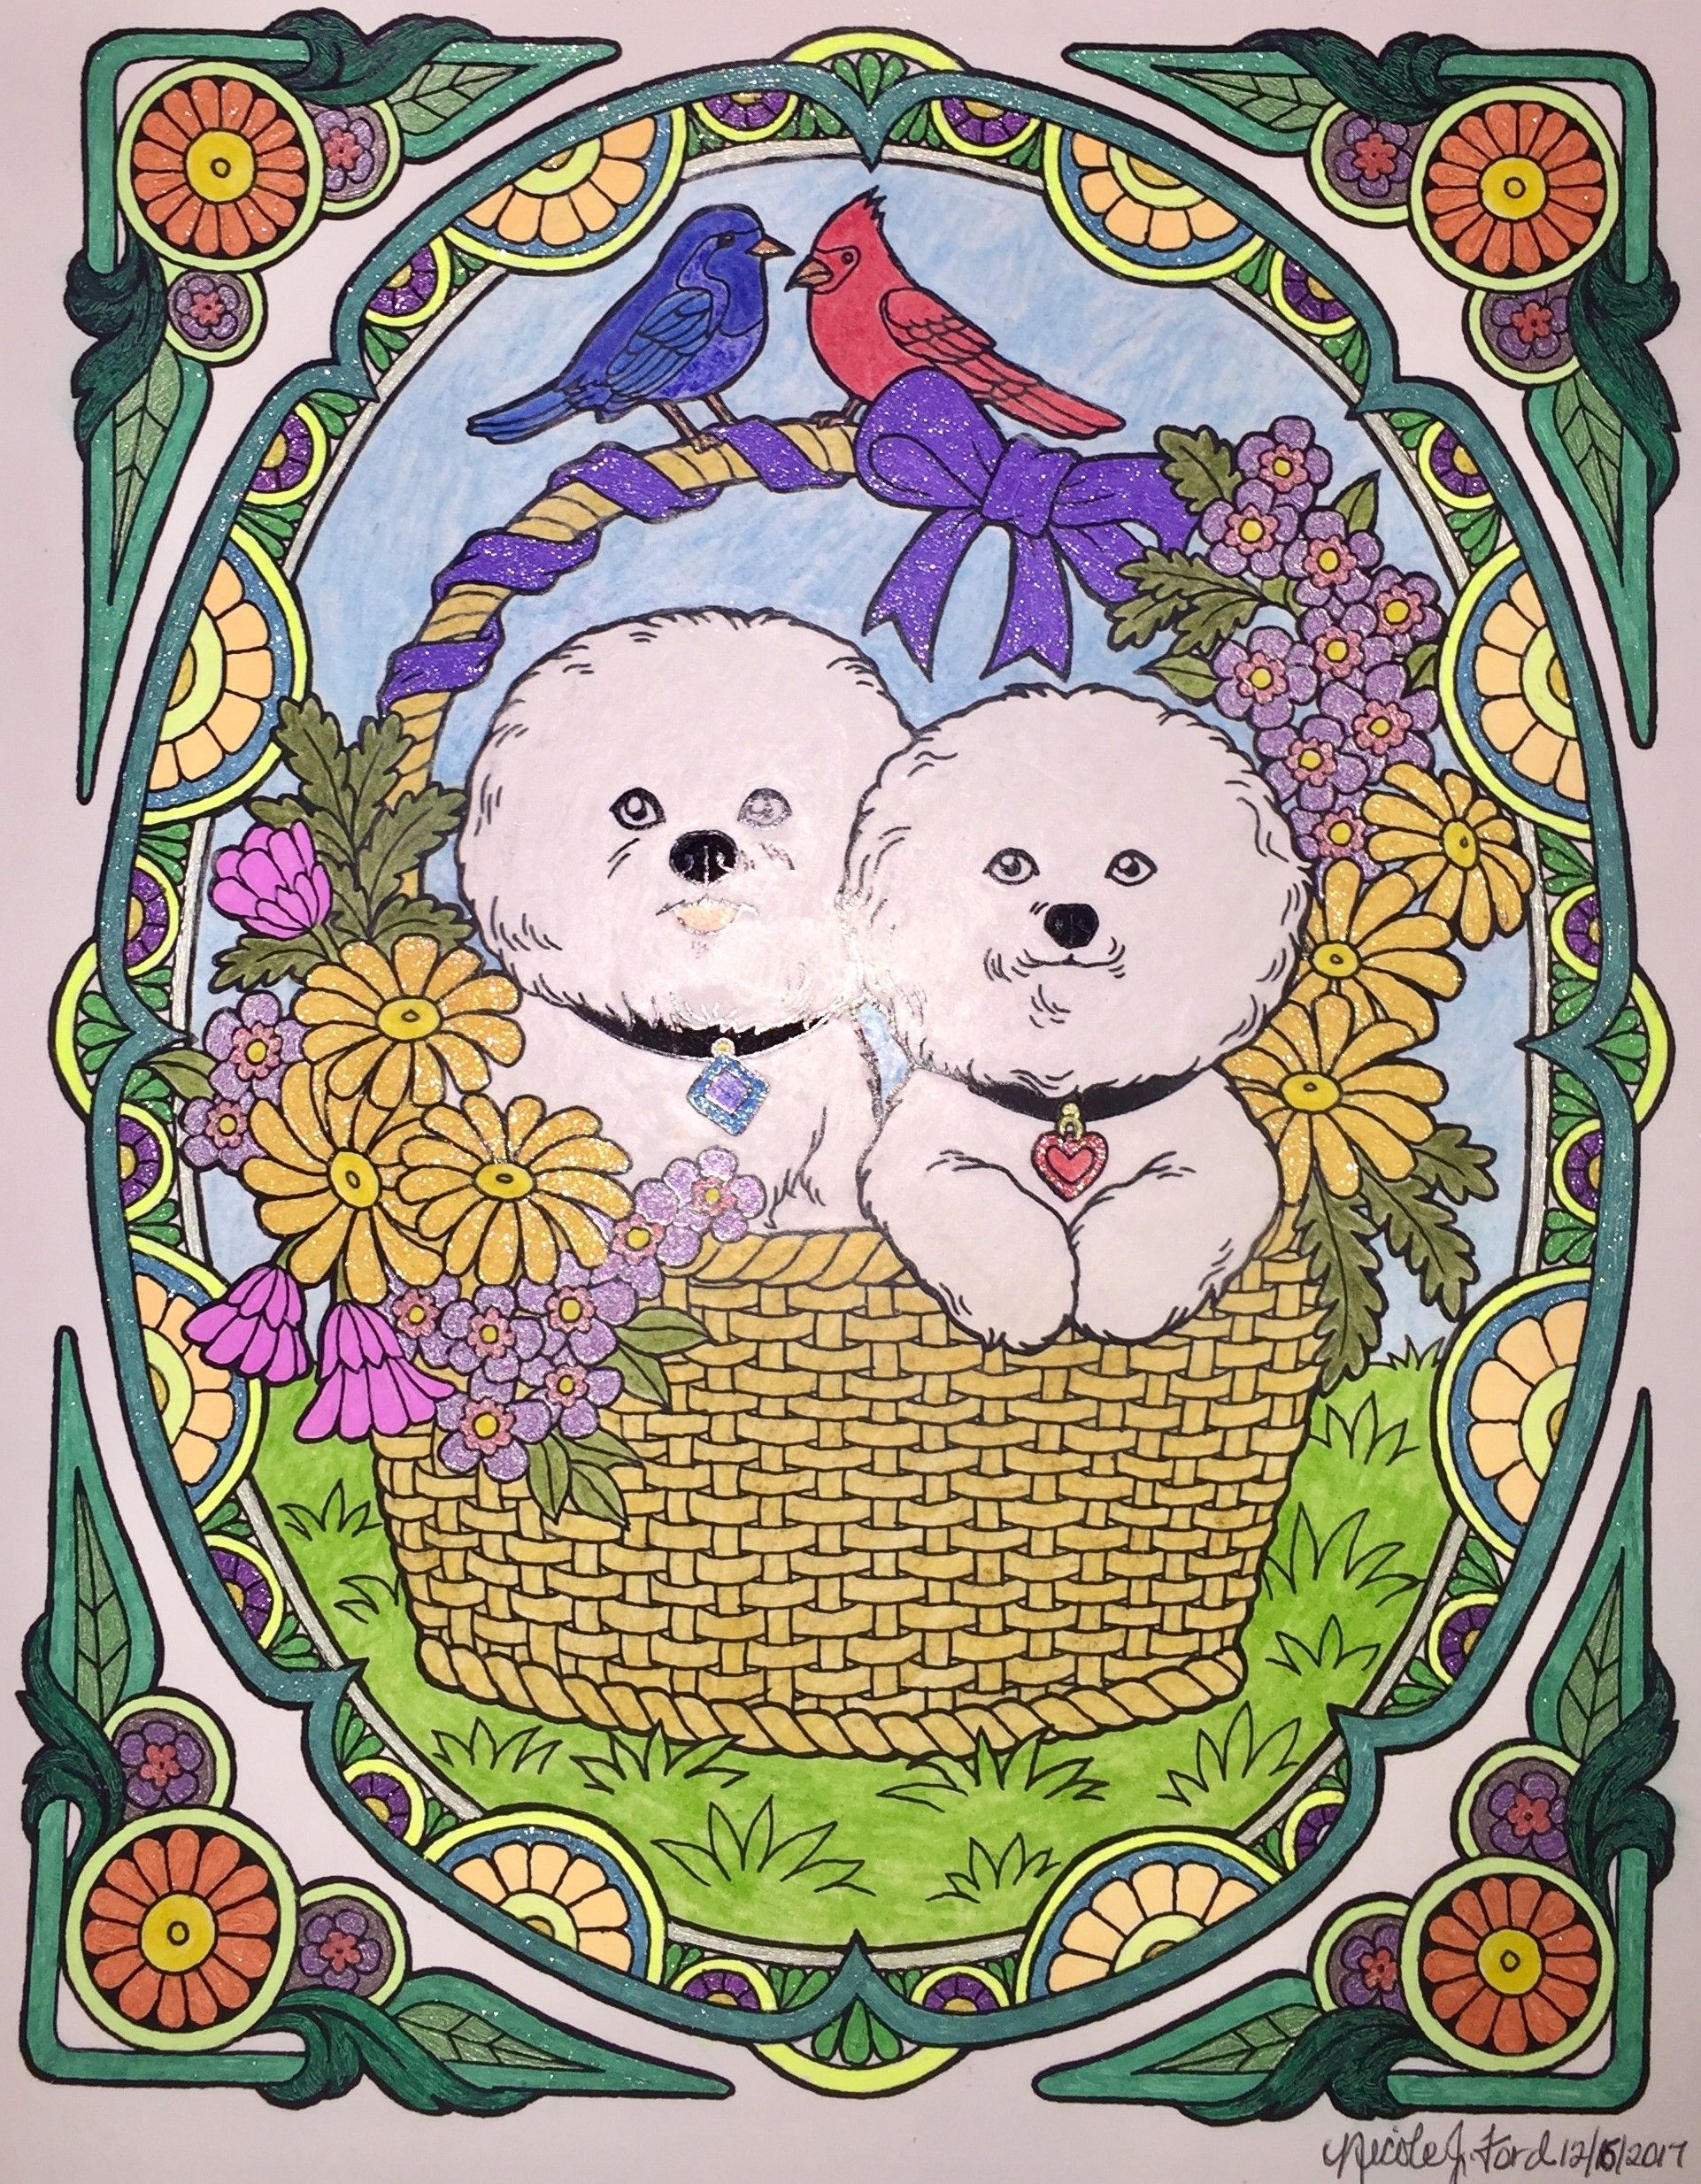 Colorit dogs everyoneus best friend adult coloring book colorist